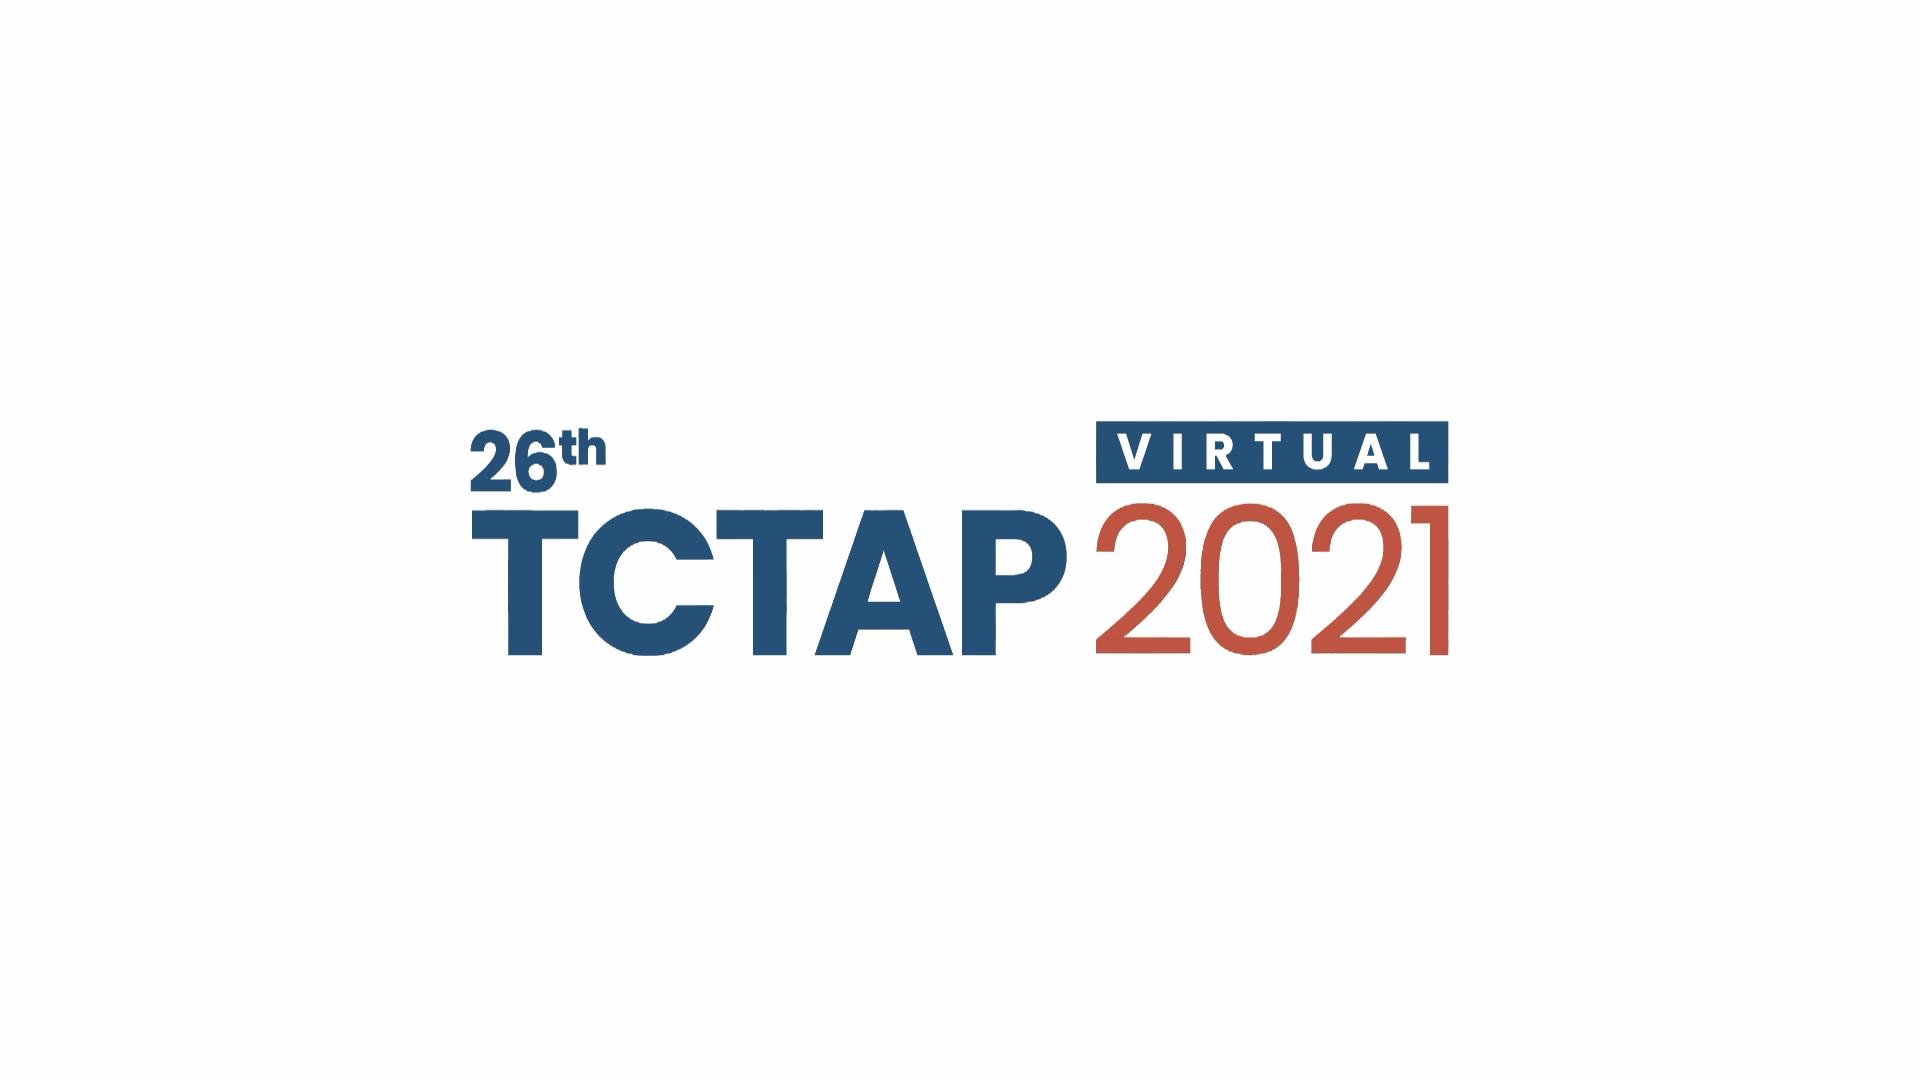 [TCTAP 2021 Virtual] Main Arena - Opening of TCTAP 2021 Virtual